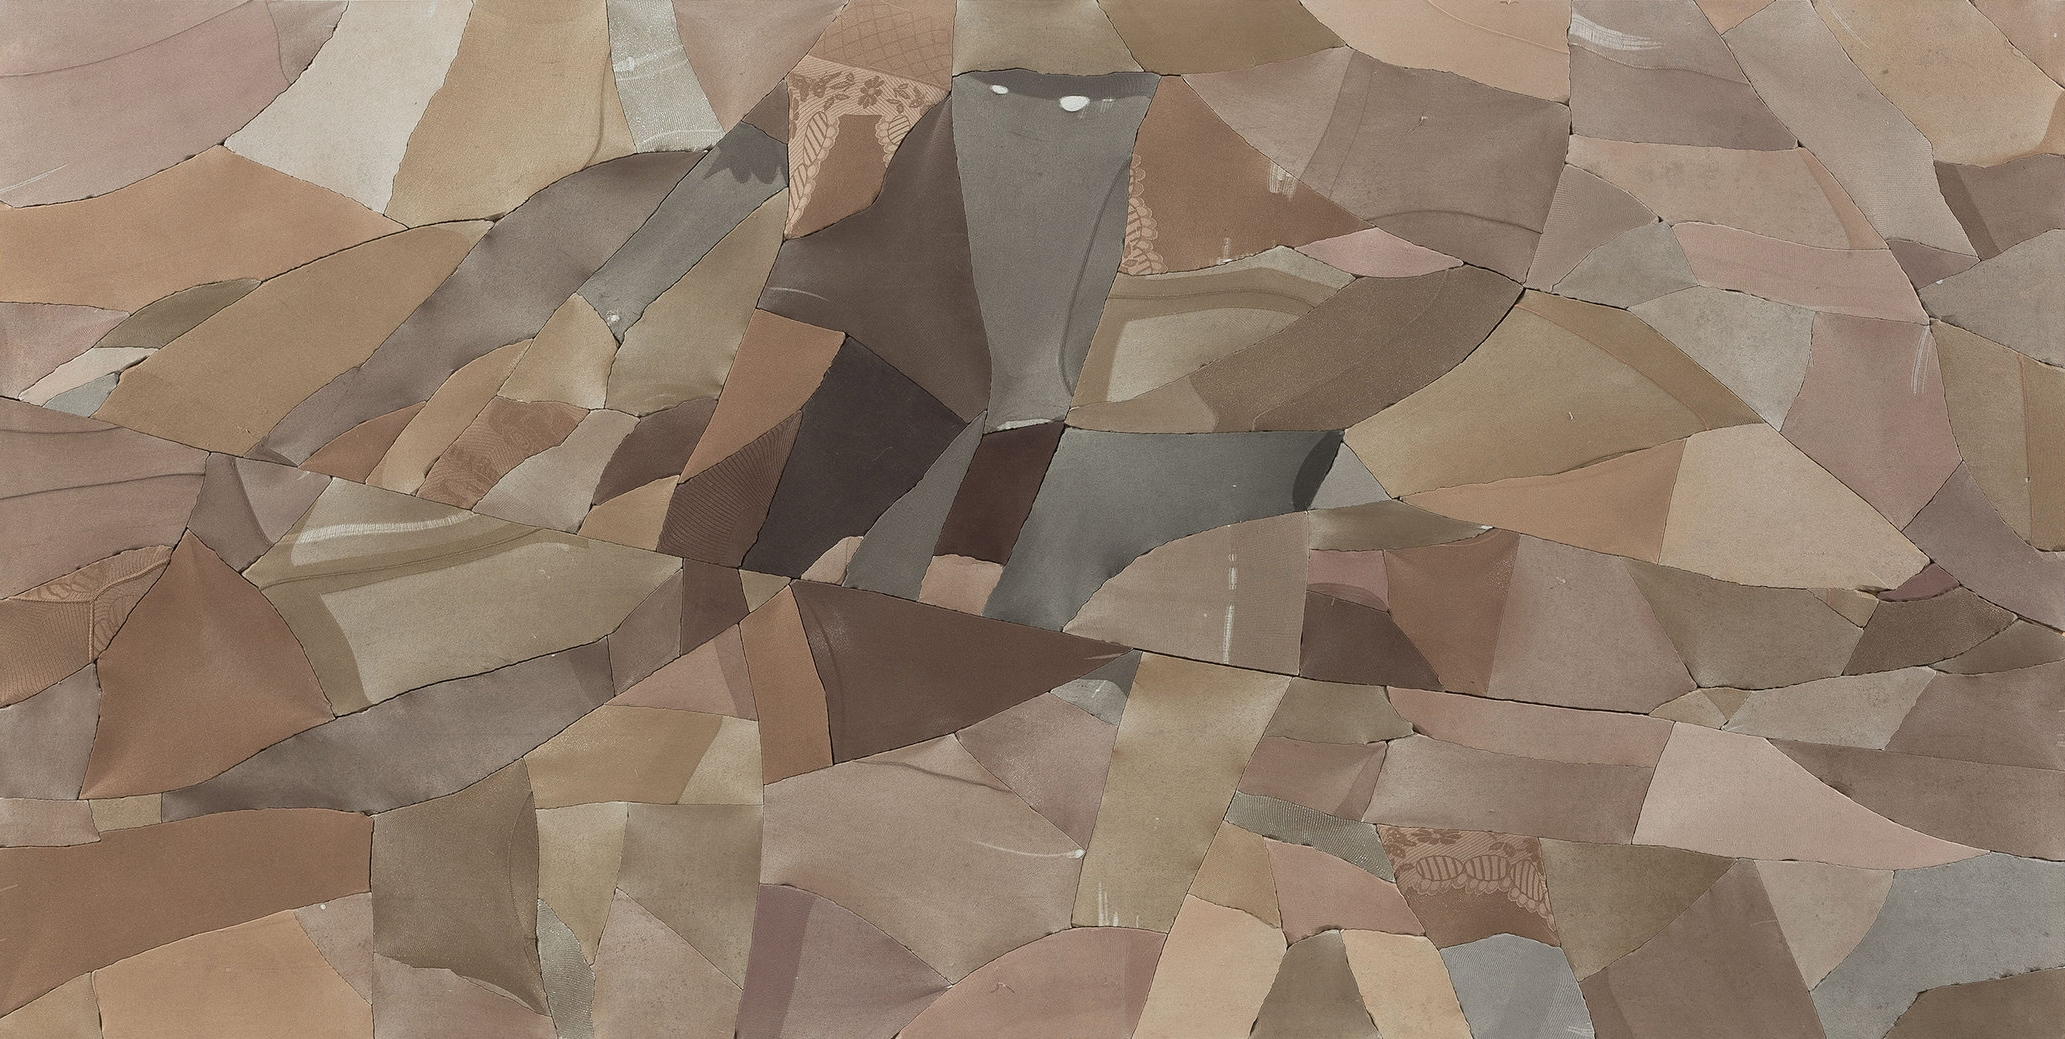 Ma Qiusha, Wonderland Ravine, 2016, Cement, nylon stocking, plywood, resin, steel, 123 x 245 x 5.5 cm. Courtesy of the artist & Beijing Commune.